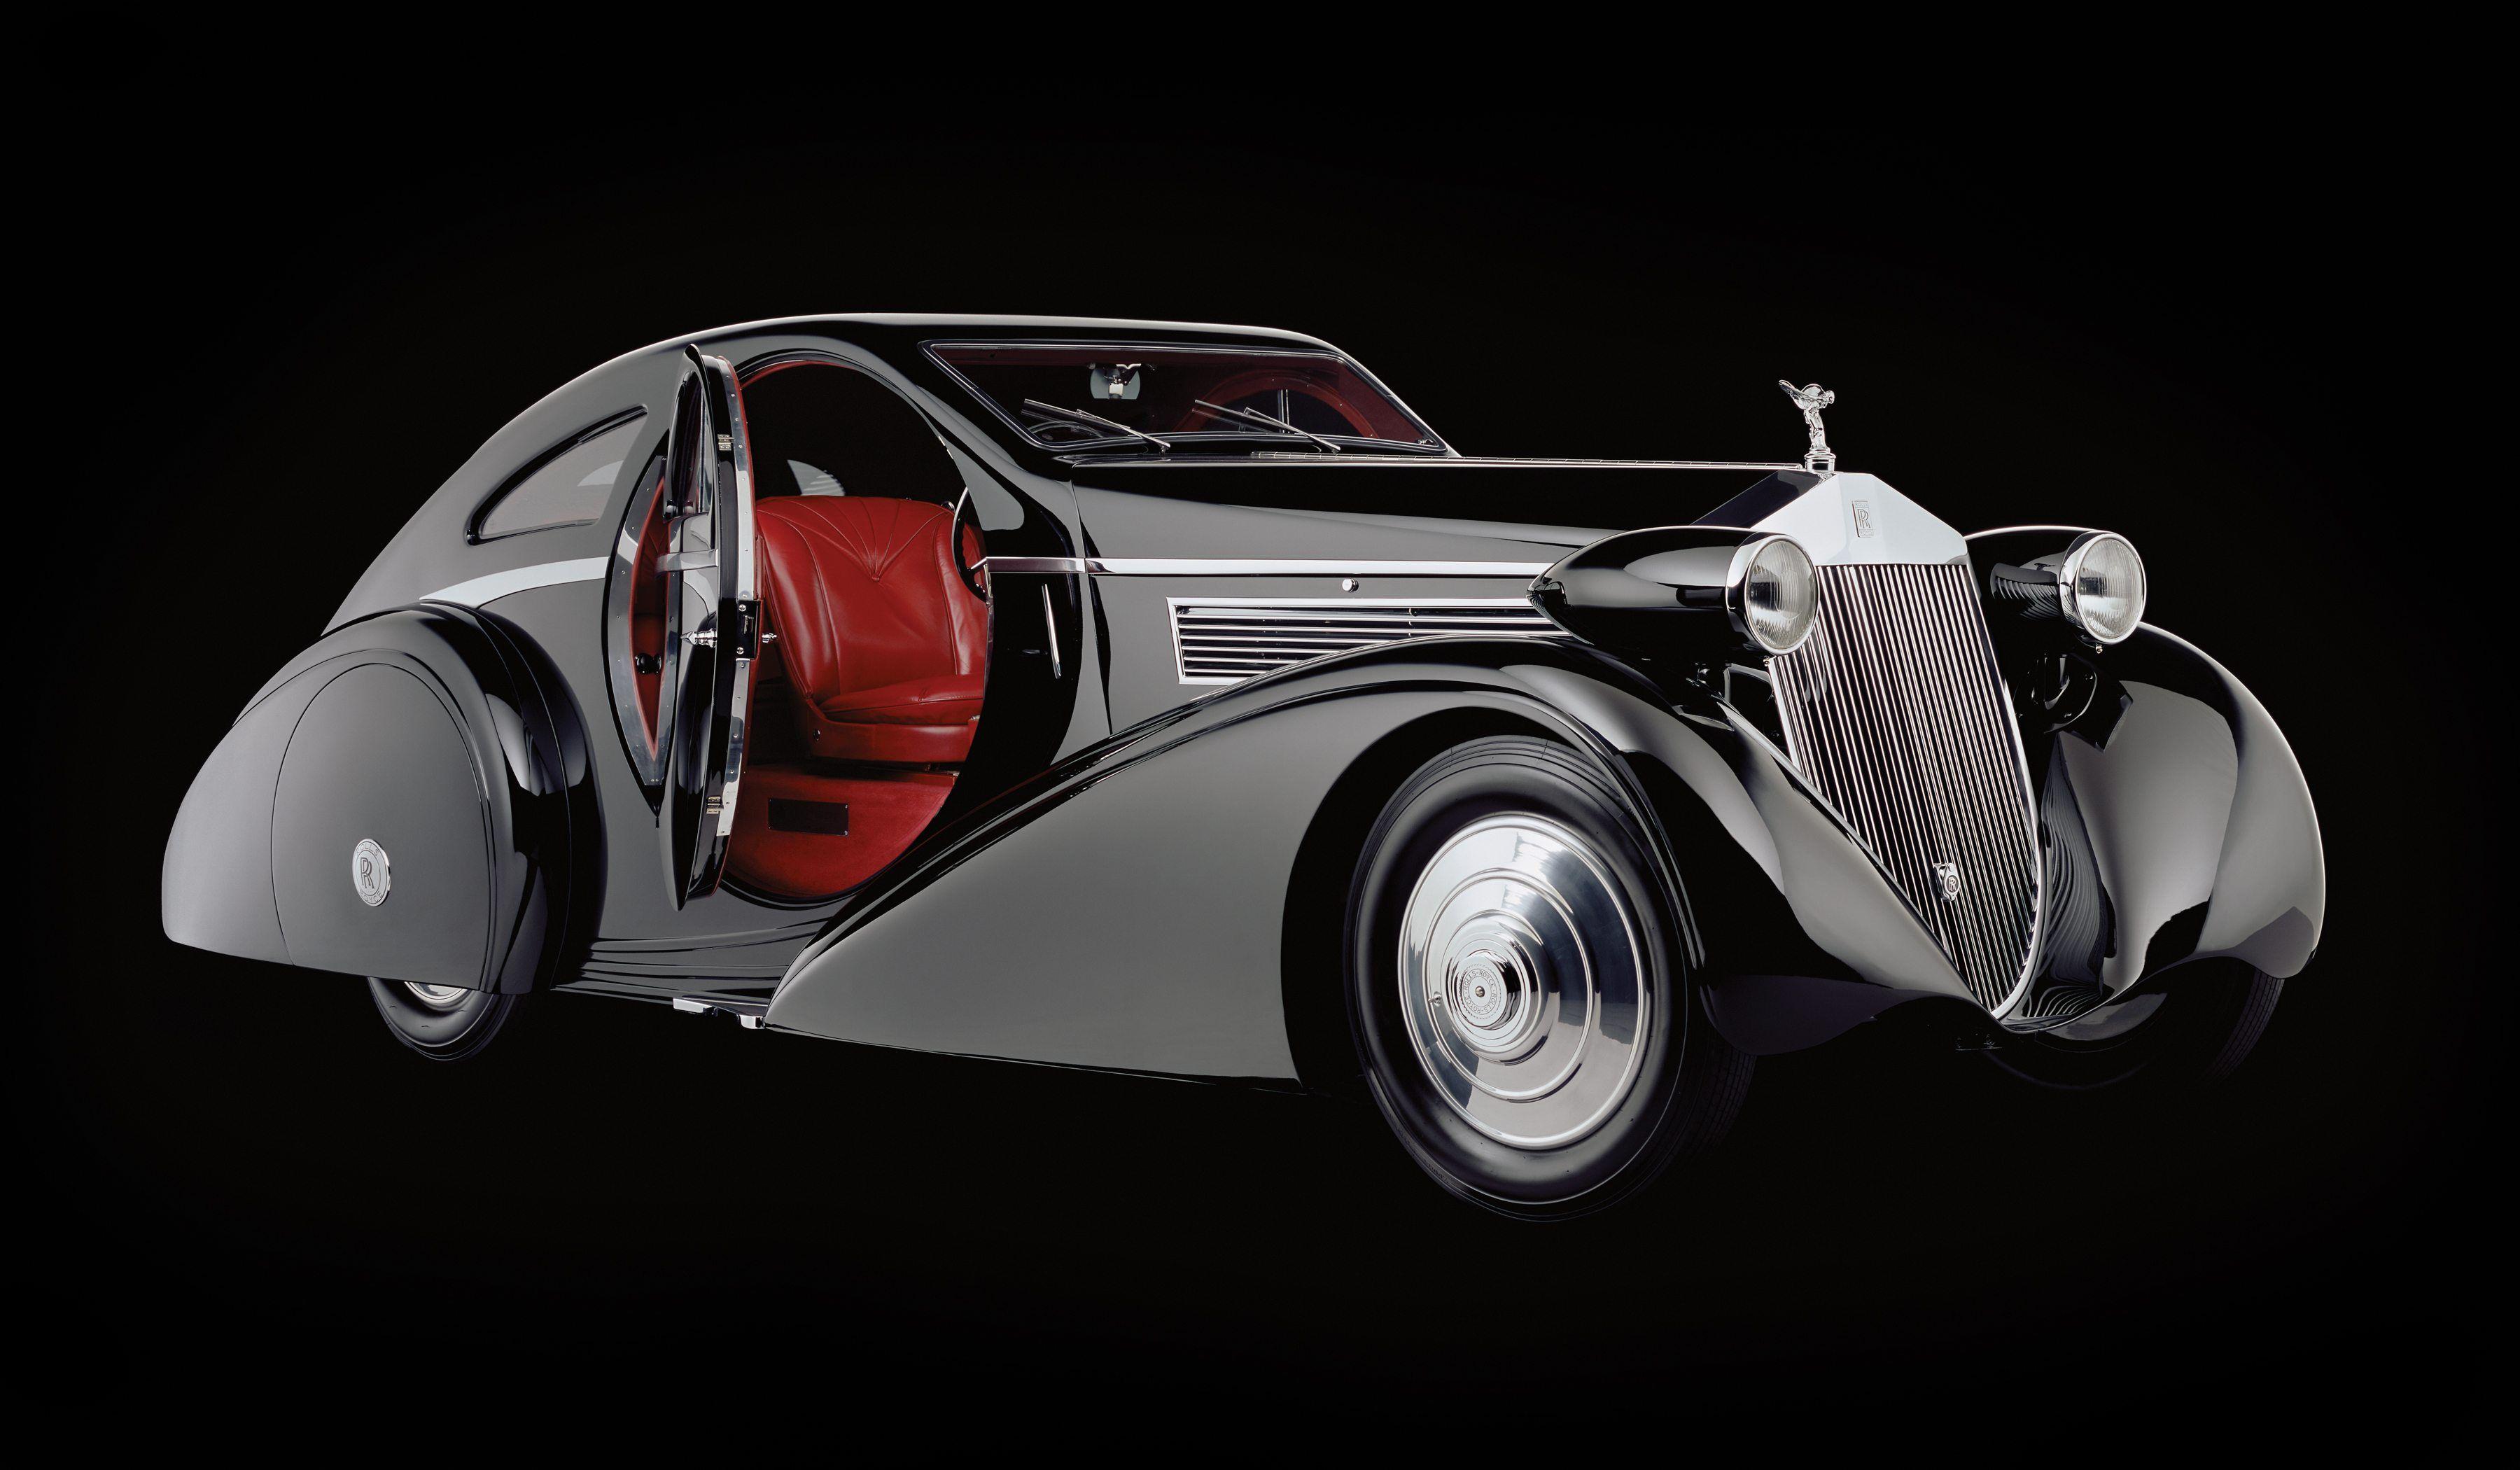 1925 Rolls Royce Phantom >> 1925 Rolls Royce Phantom Rolls Royce Phantom Rolls Royce